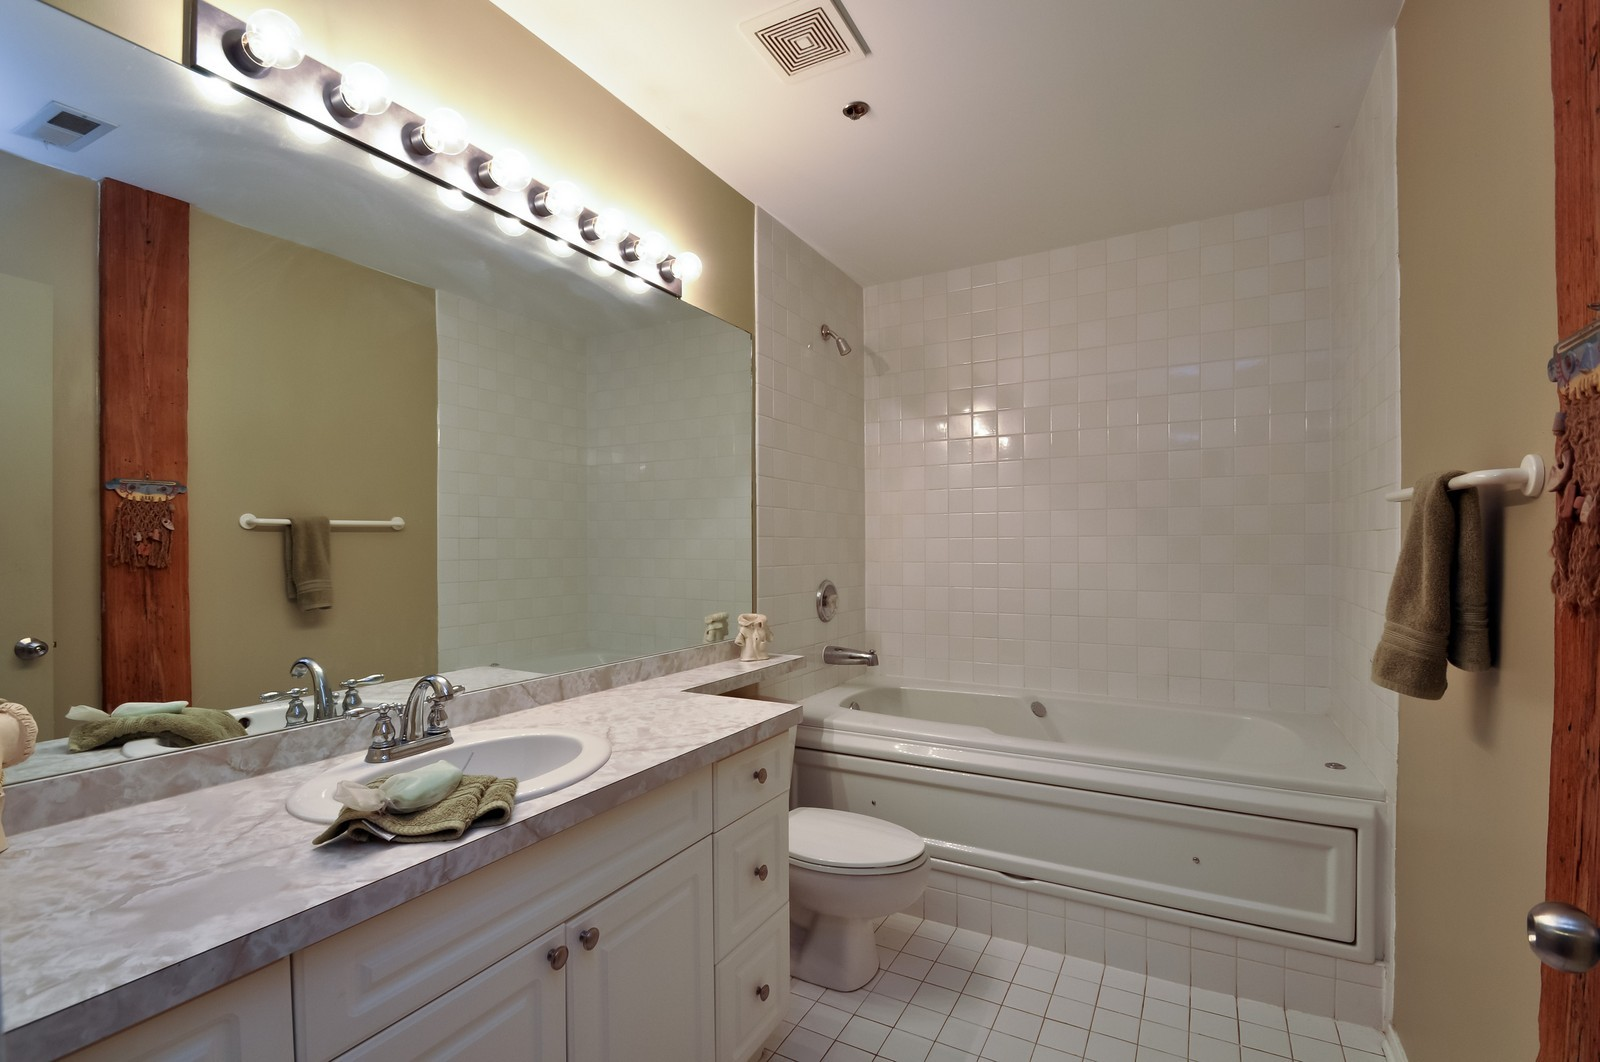 Real Estate Photography - 616 W Fulton, Unit 506, Chicago, IL, 60661 - Master Bathroom